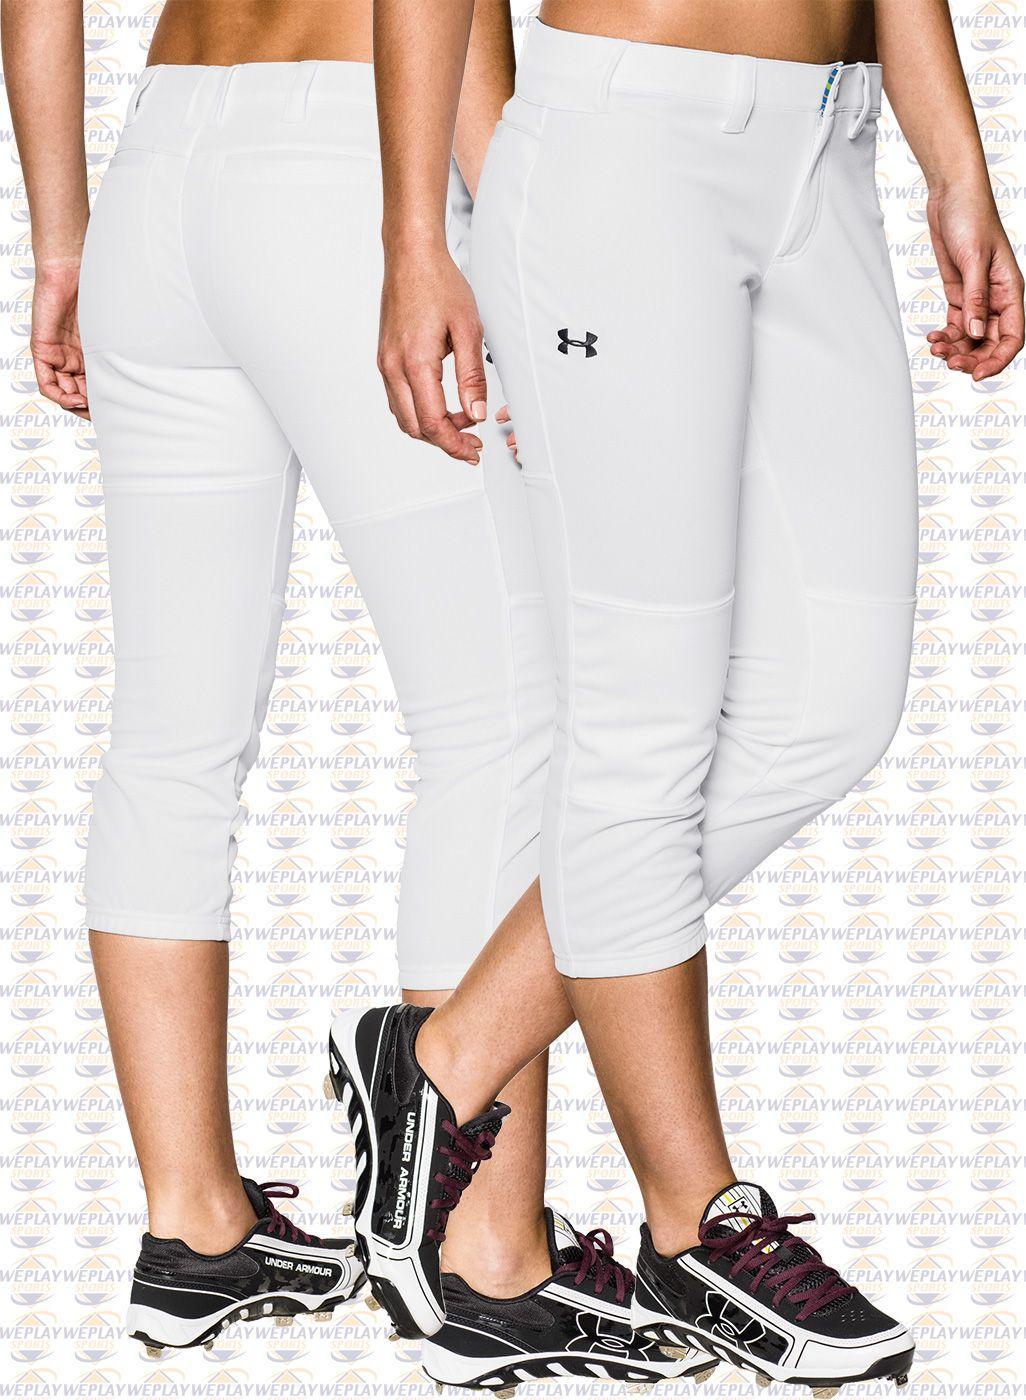 06a85a8eaa Under Armour HeatGear Strike Zone Womens Fastpitch Softball Pants ...